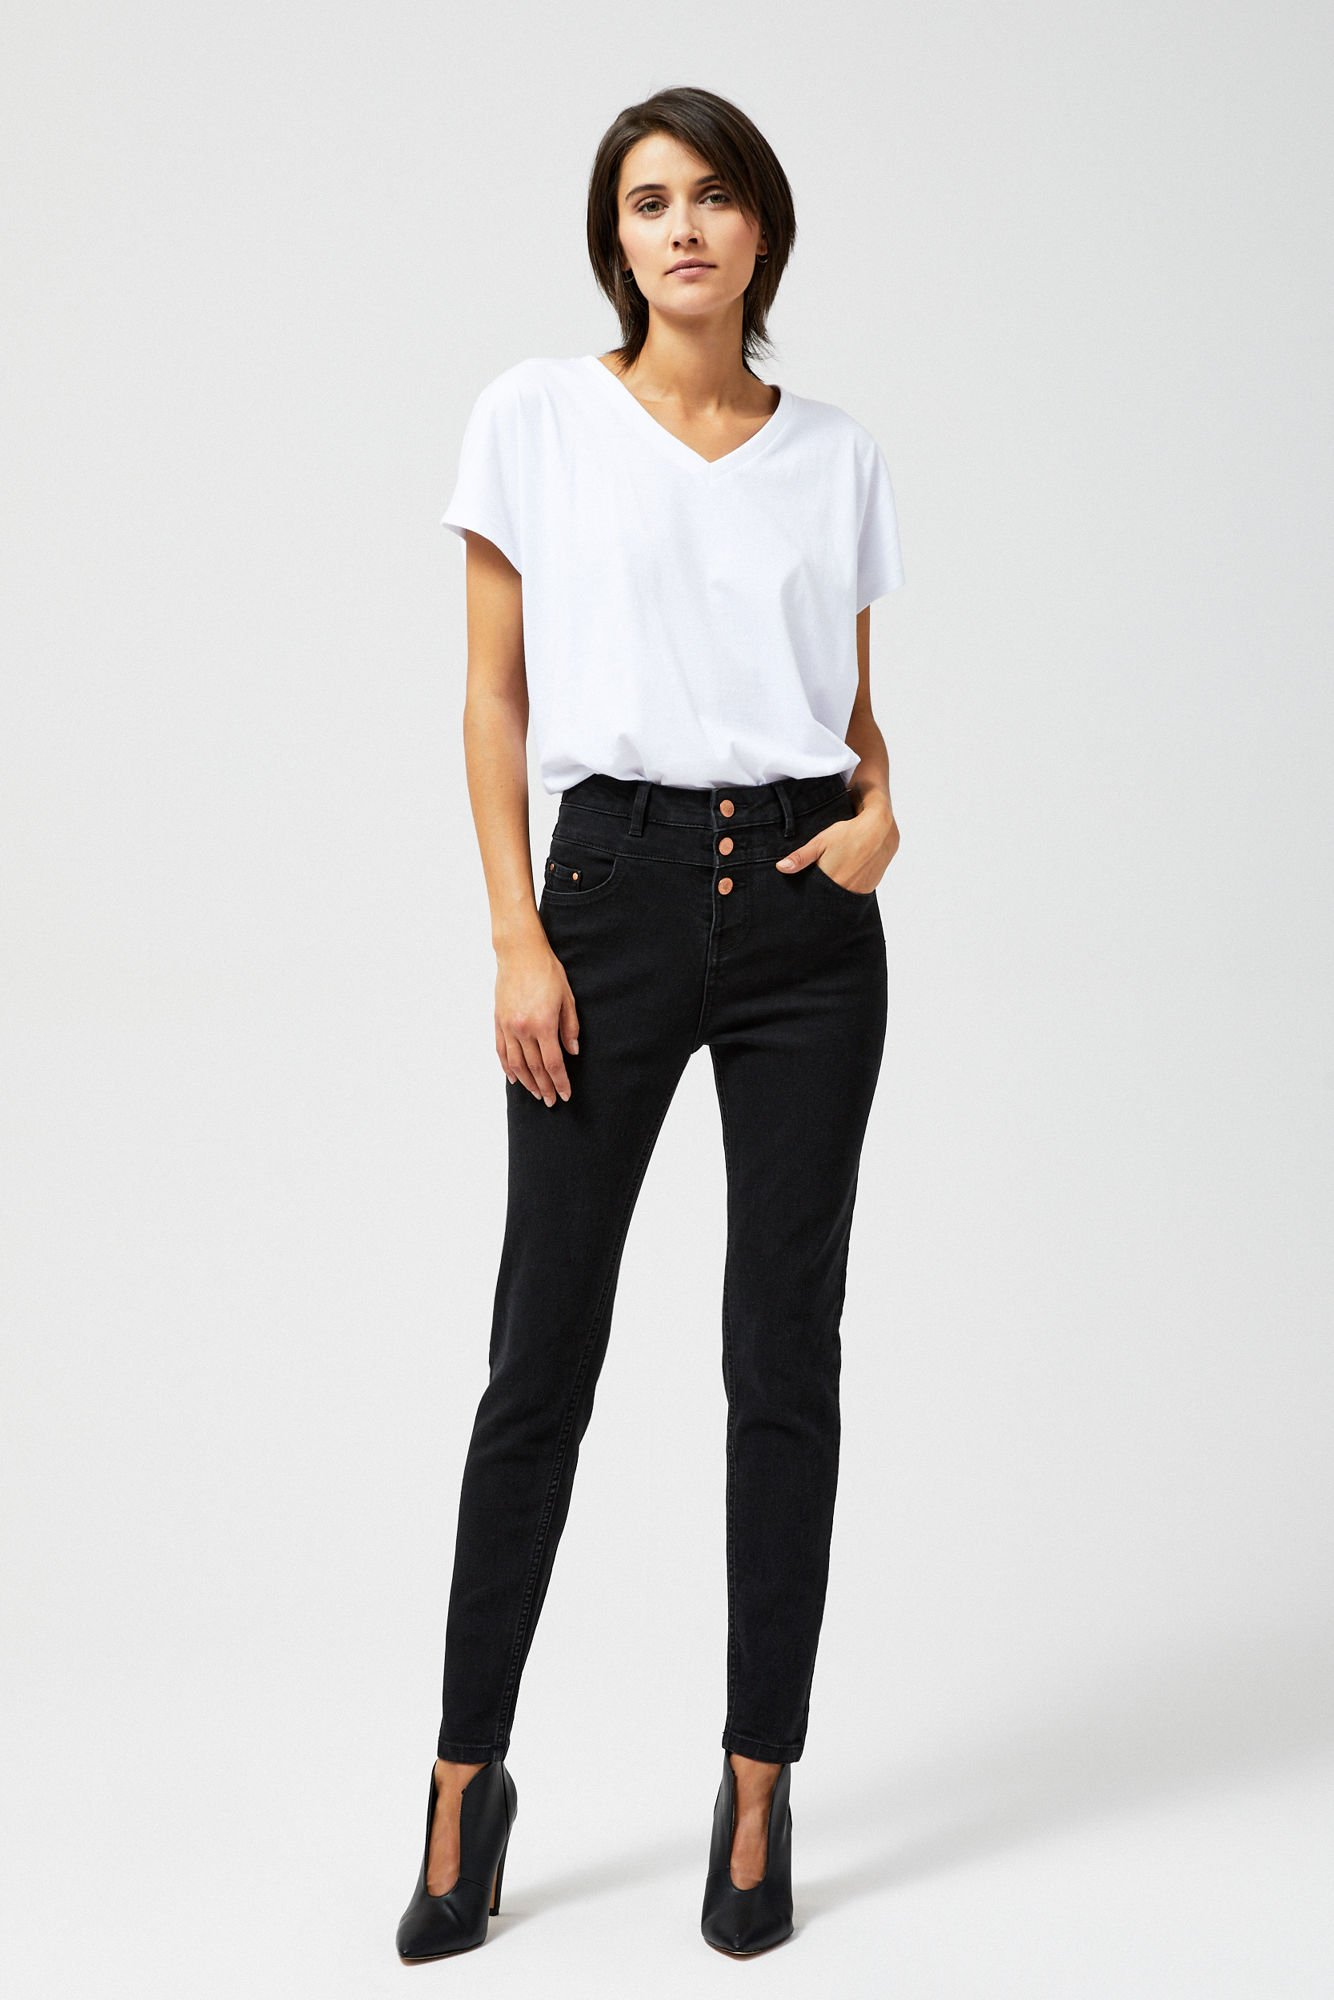 Jeansy typu extra high waist